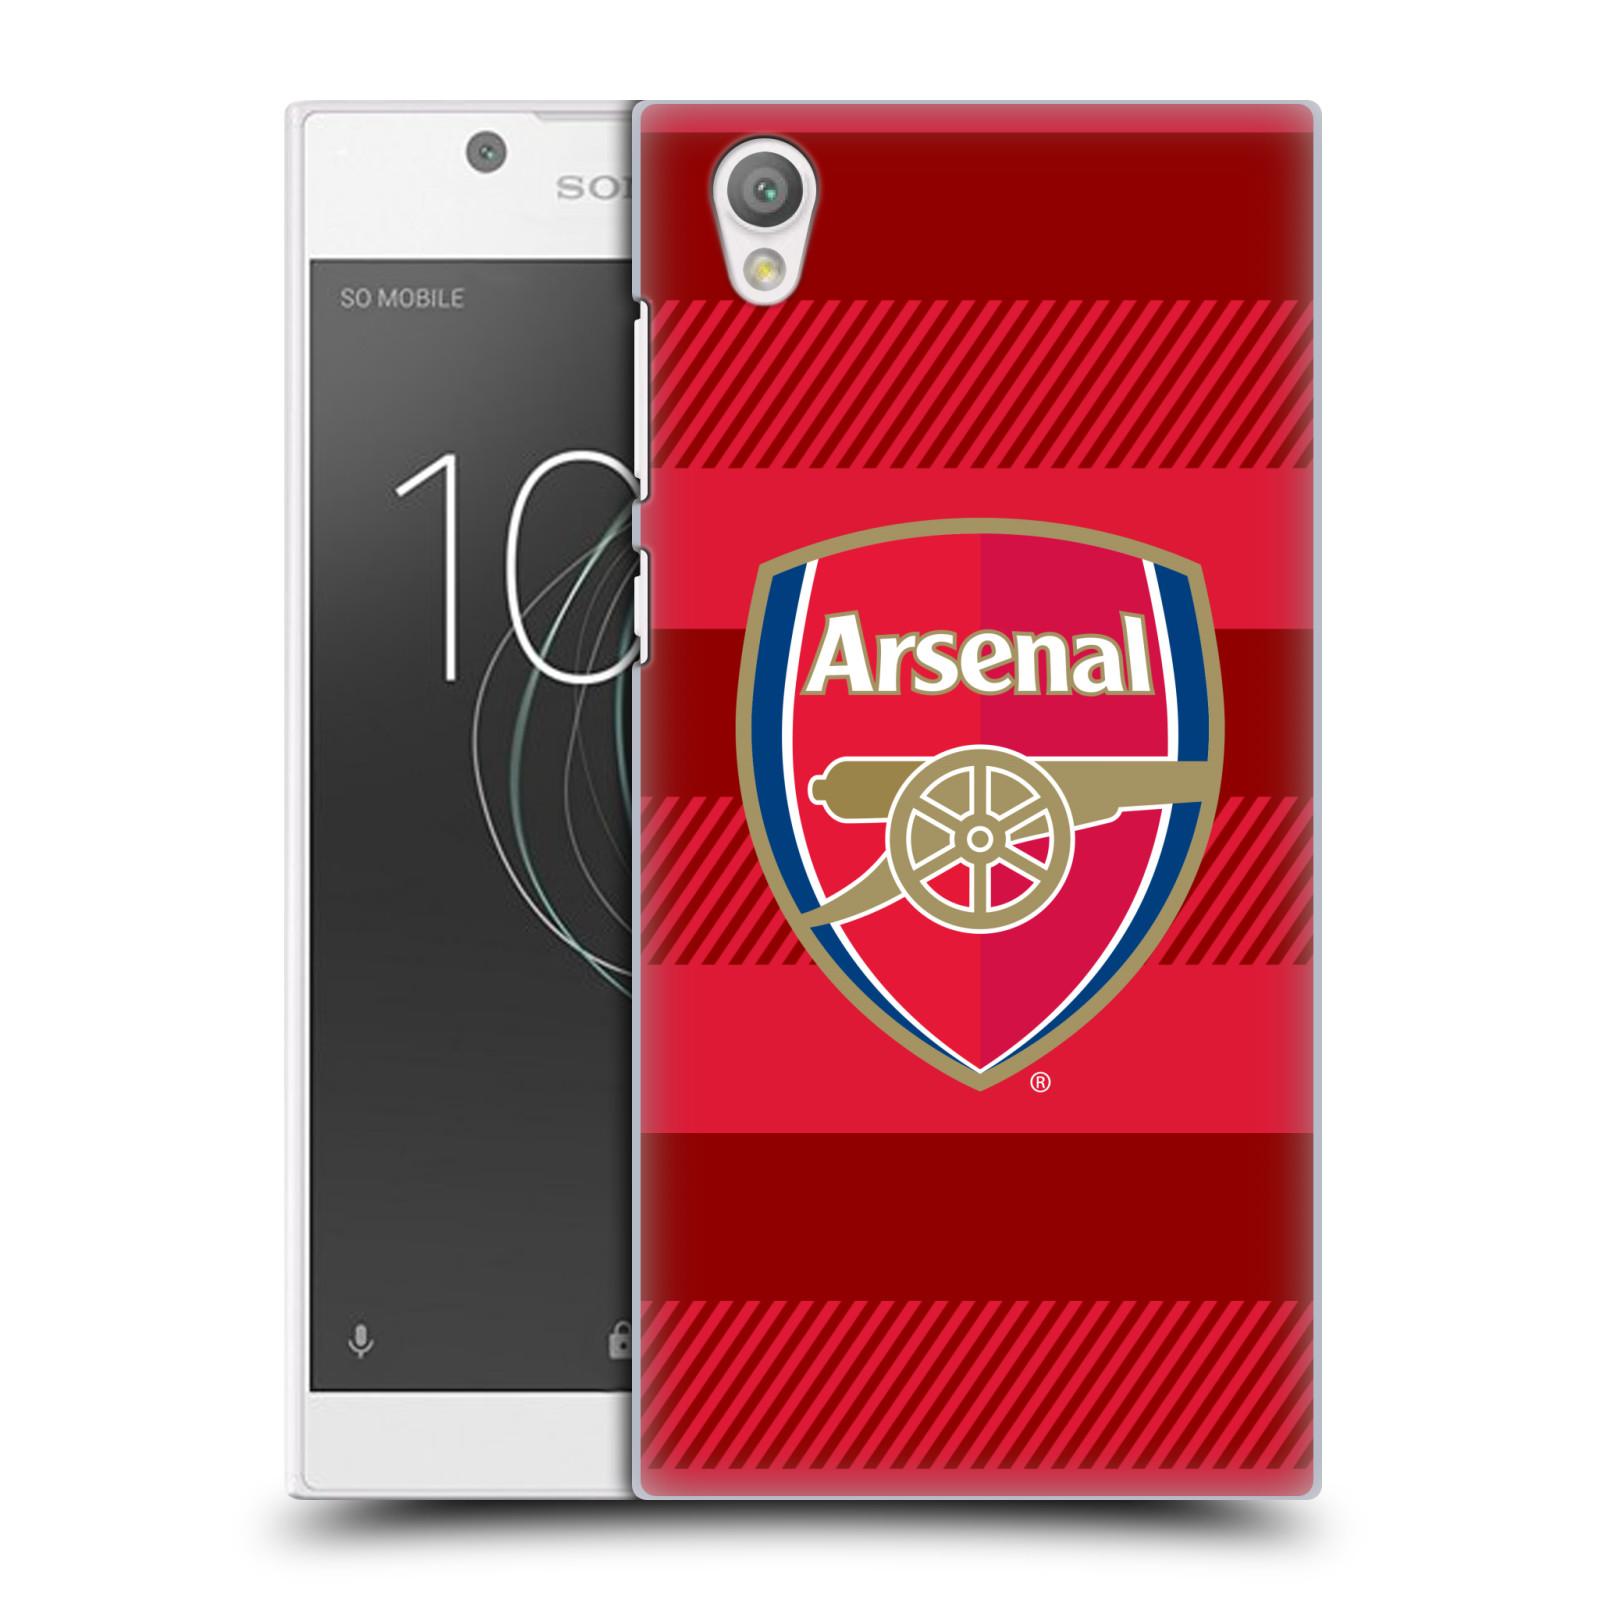 Plastové pouzdro na mobil Sony Xperia L1 - Head Case - Arsenal FC - Logo s pruhy